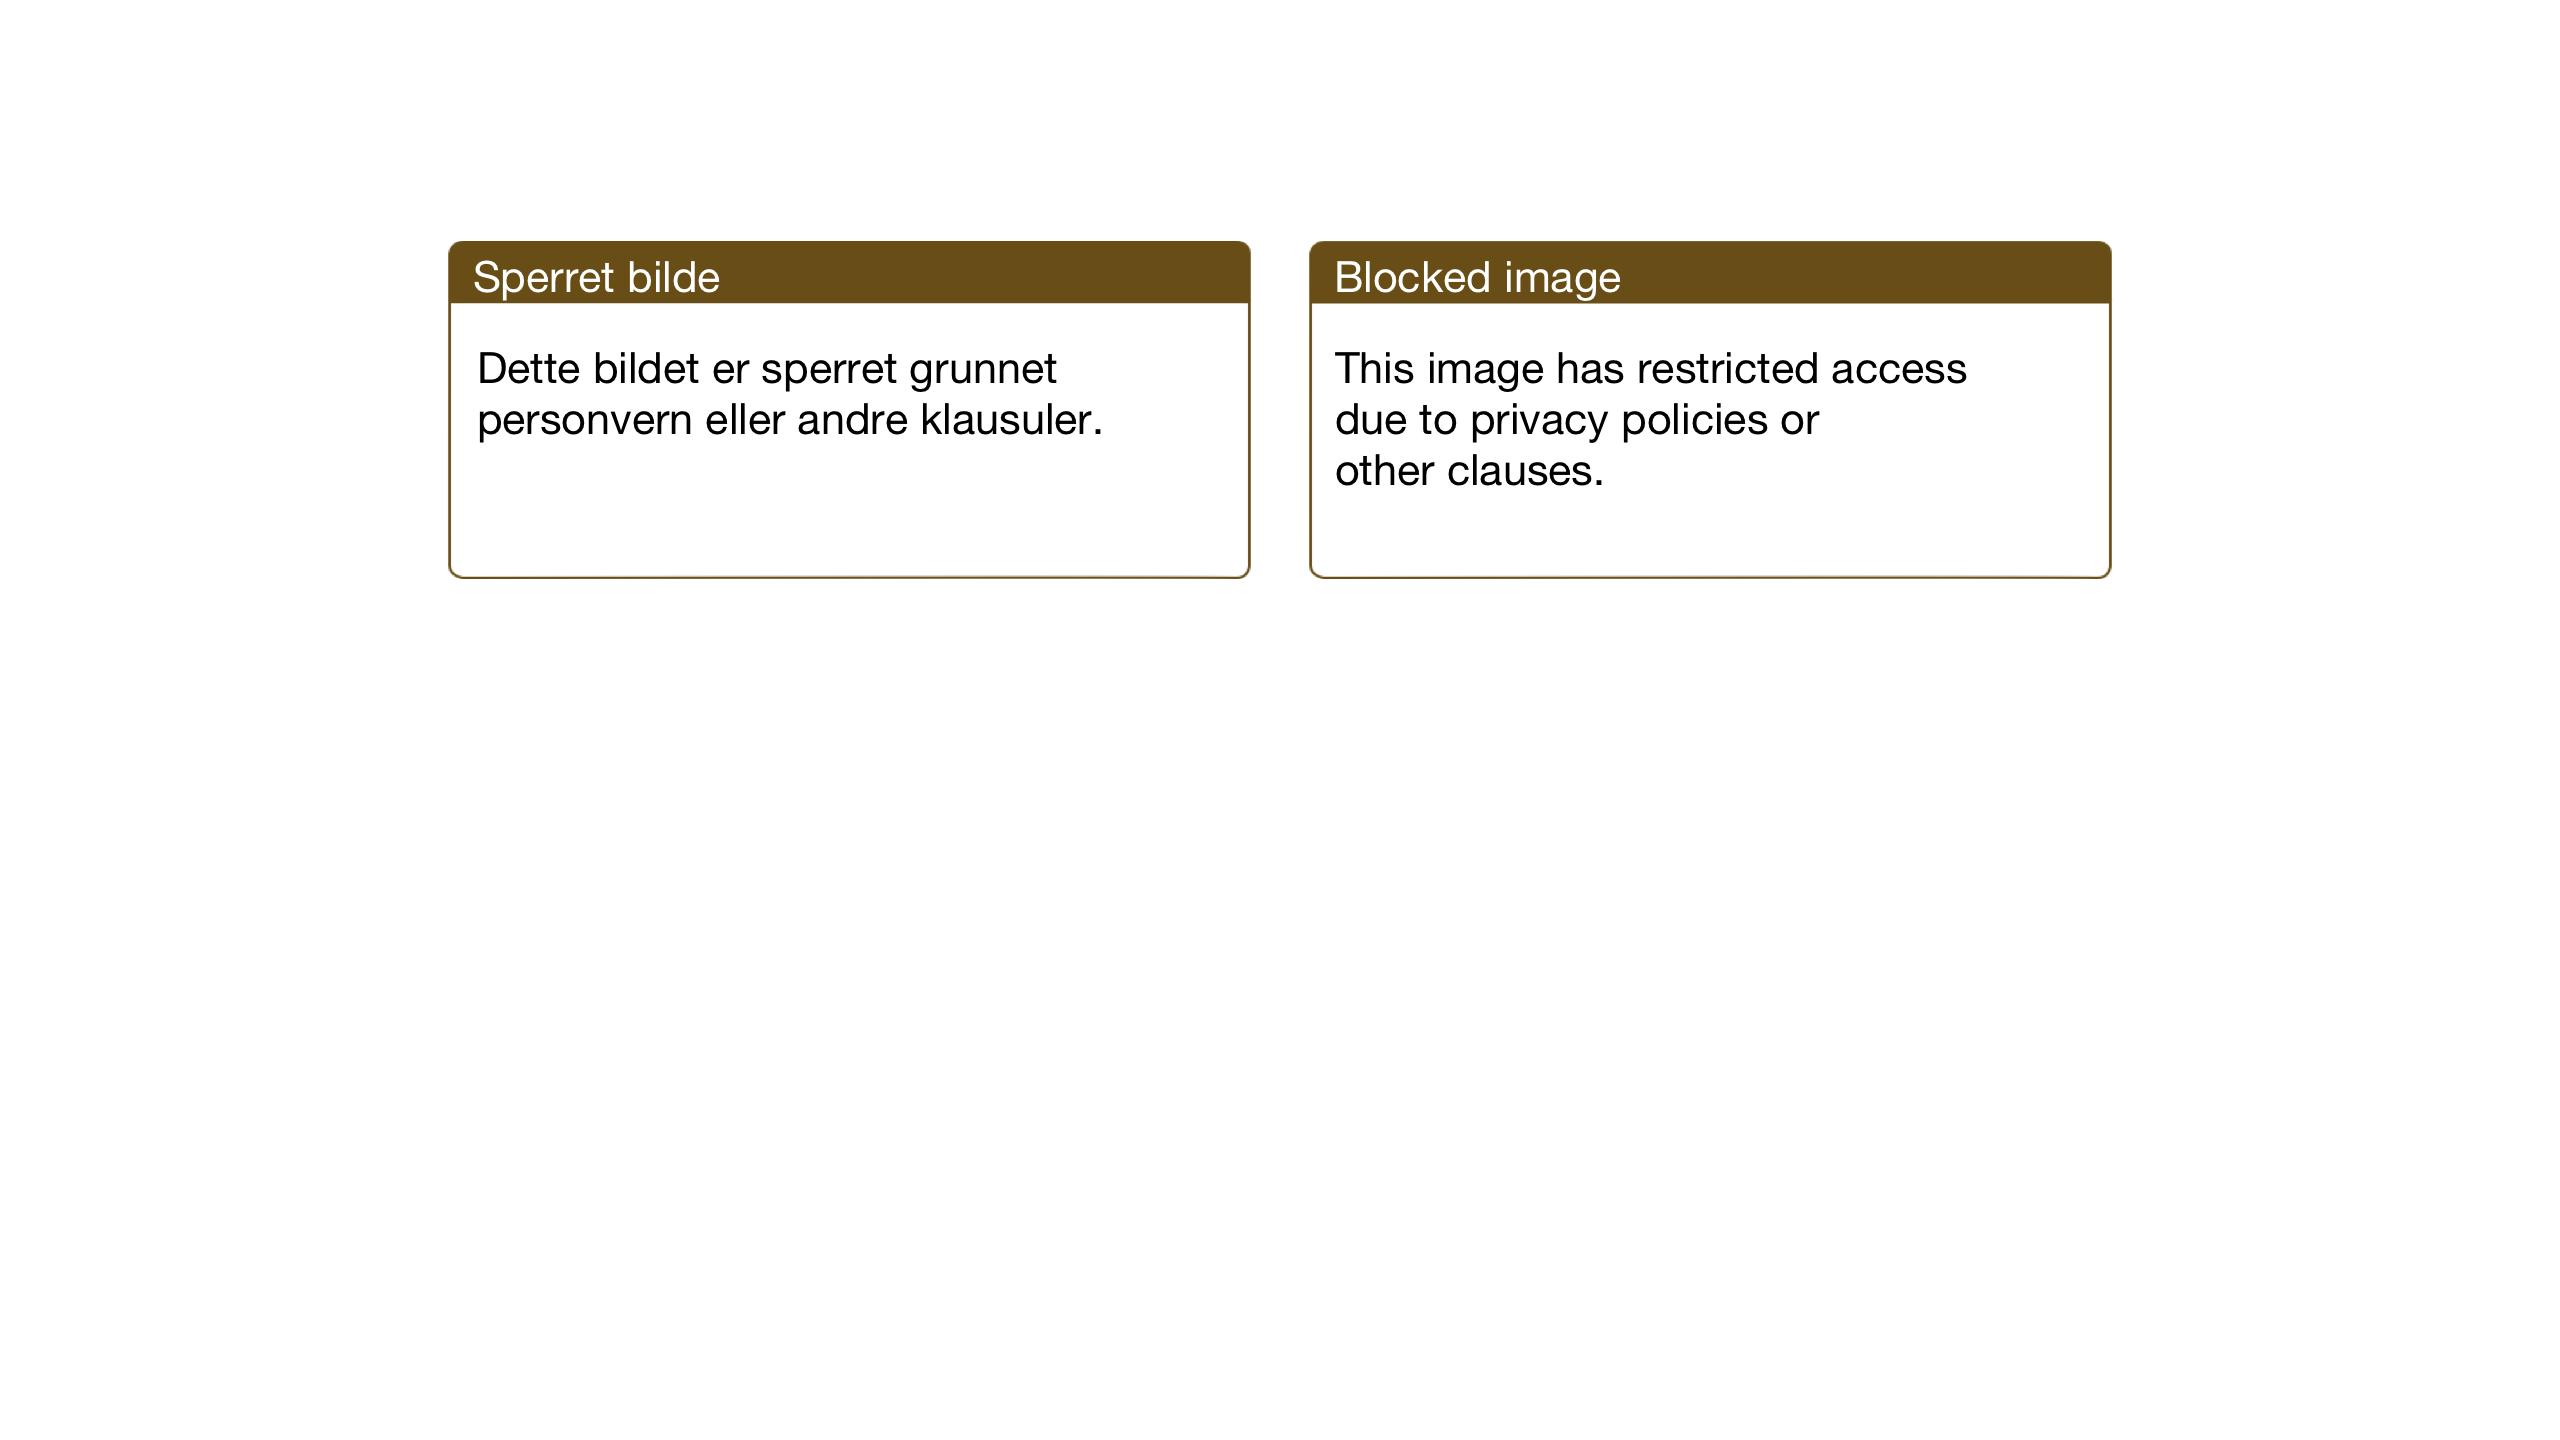 SAT, Ministerialprotokoller, klokkerbøker og fødselsregistre - Nordland, 847/L0680: Klokkerbok nr. 847C08, 1930-1947, s. 119